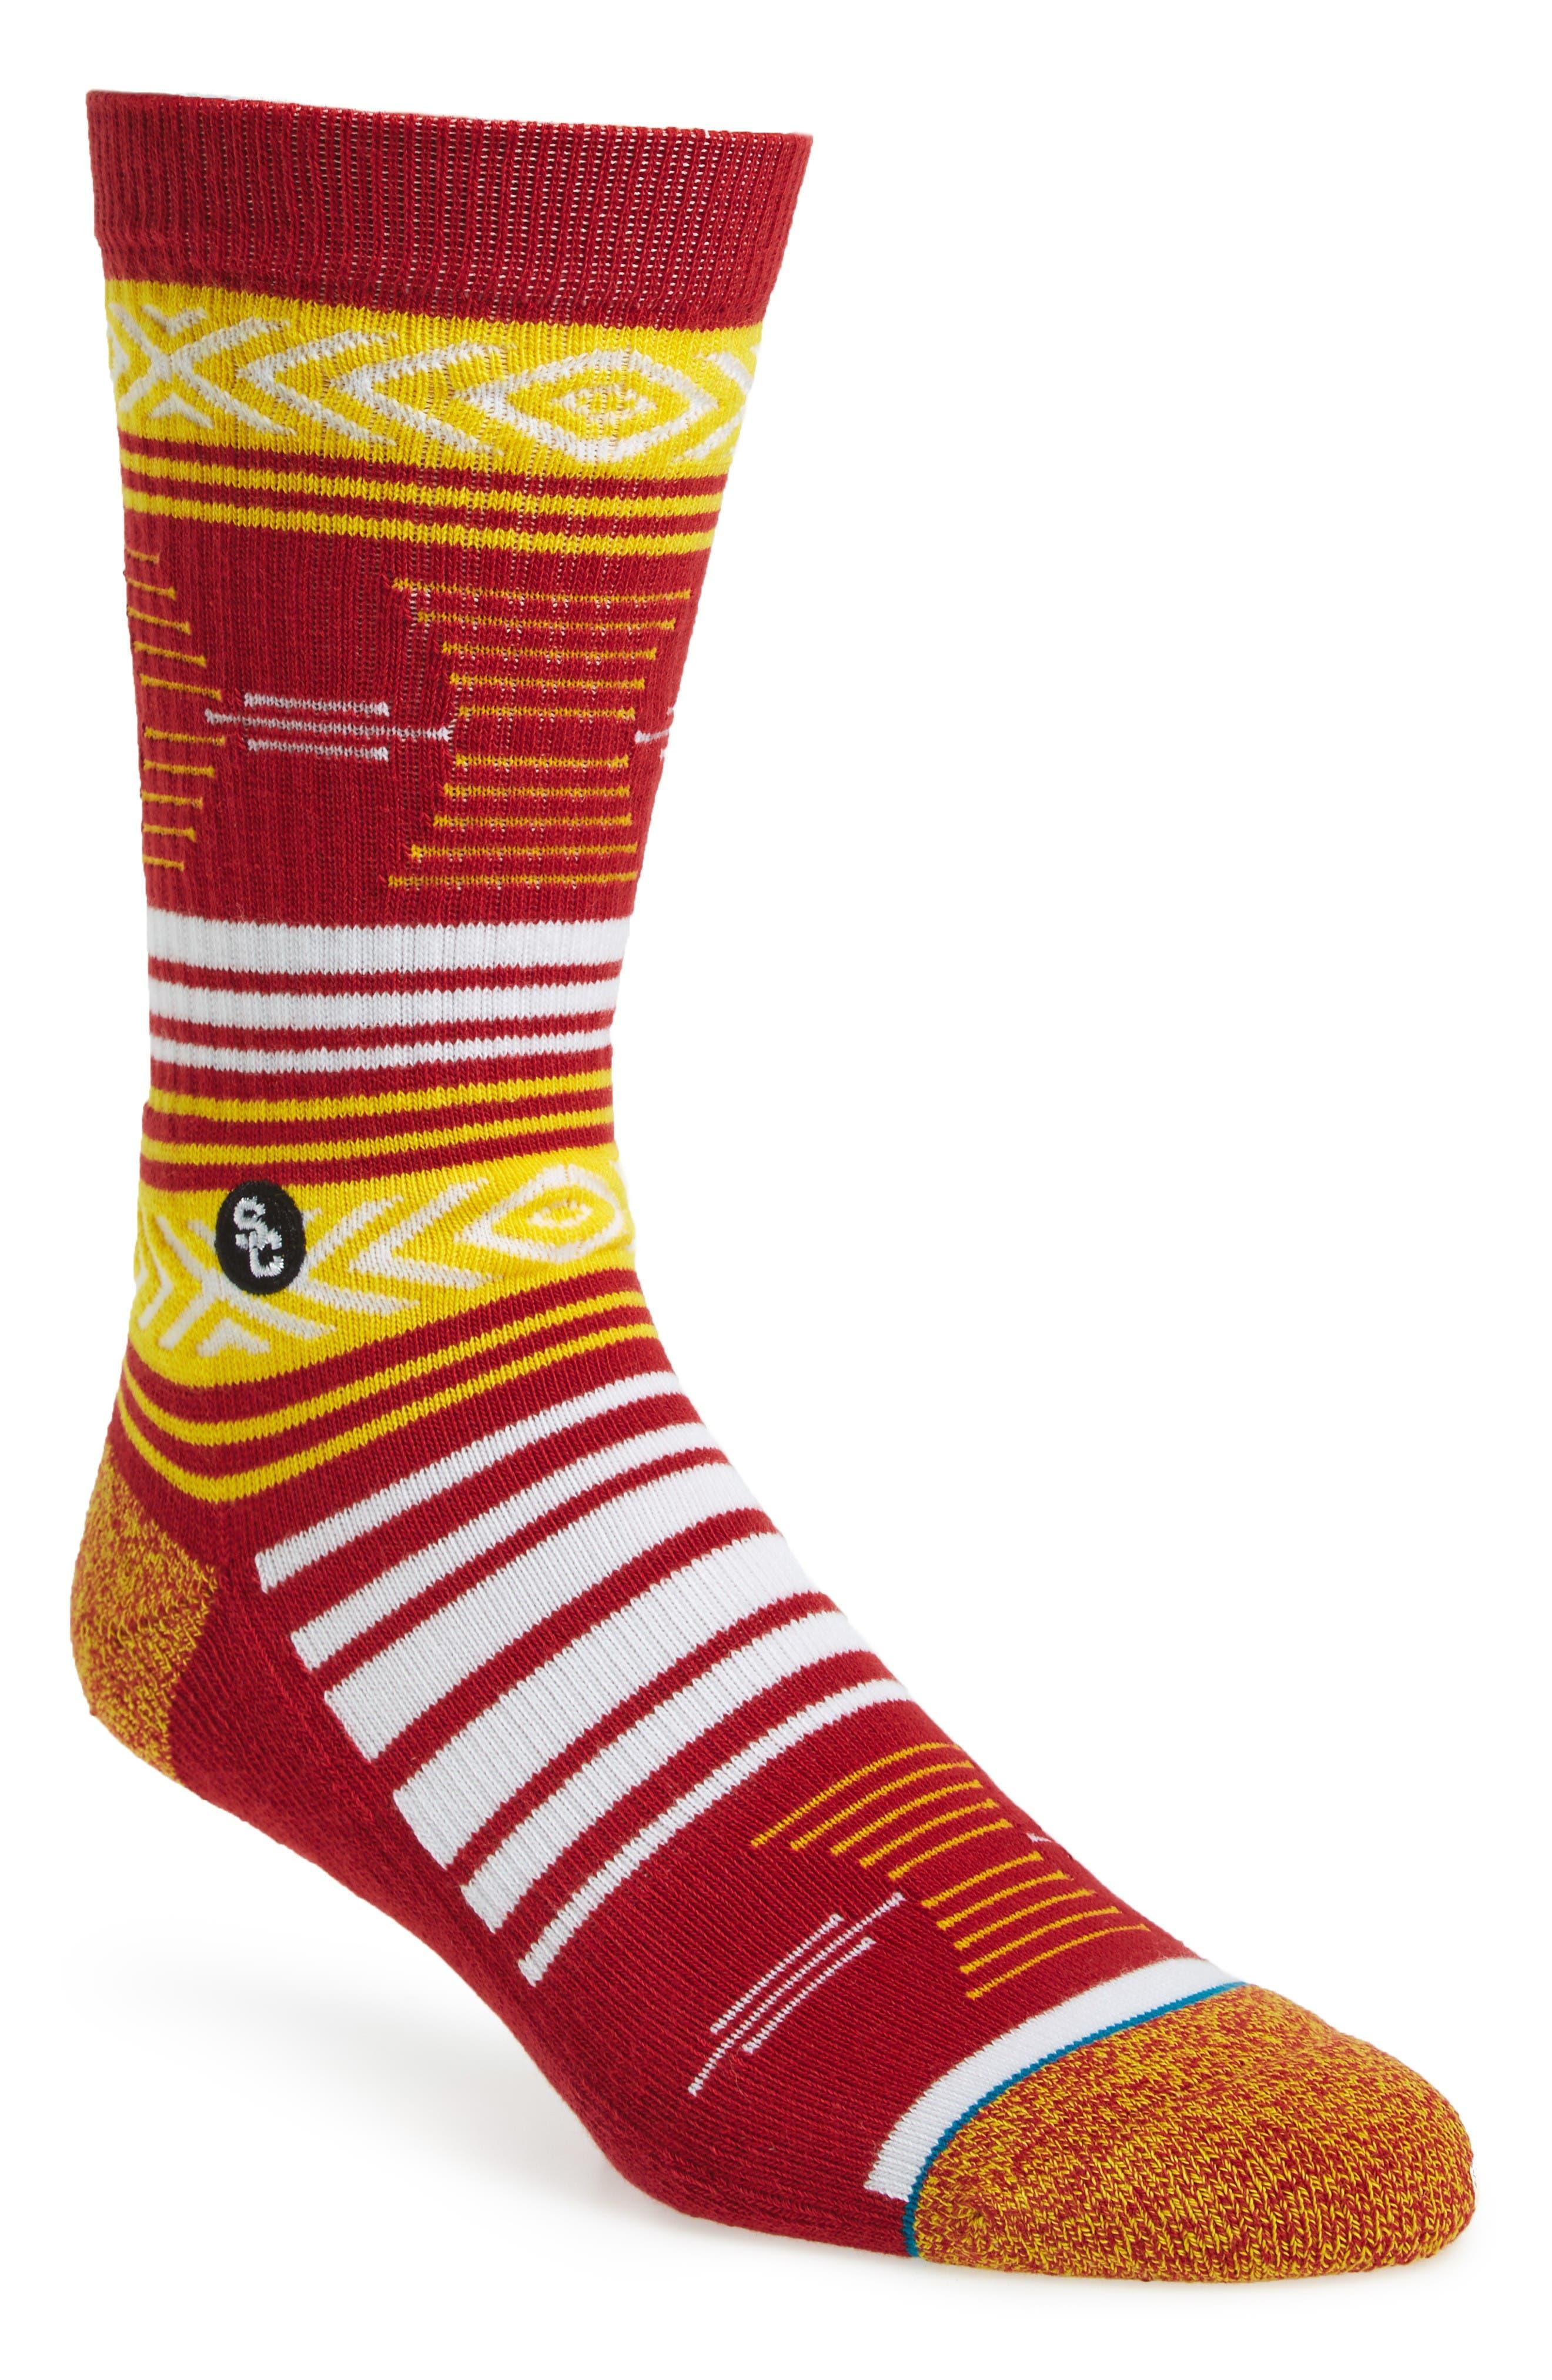 Mazed USC Trojans Socks,                         Main,                         color, Cardinal